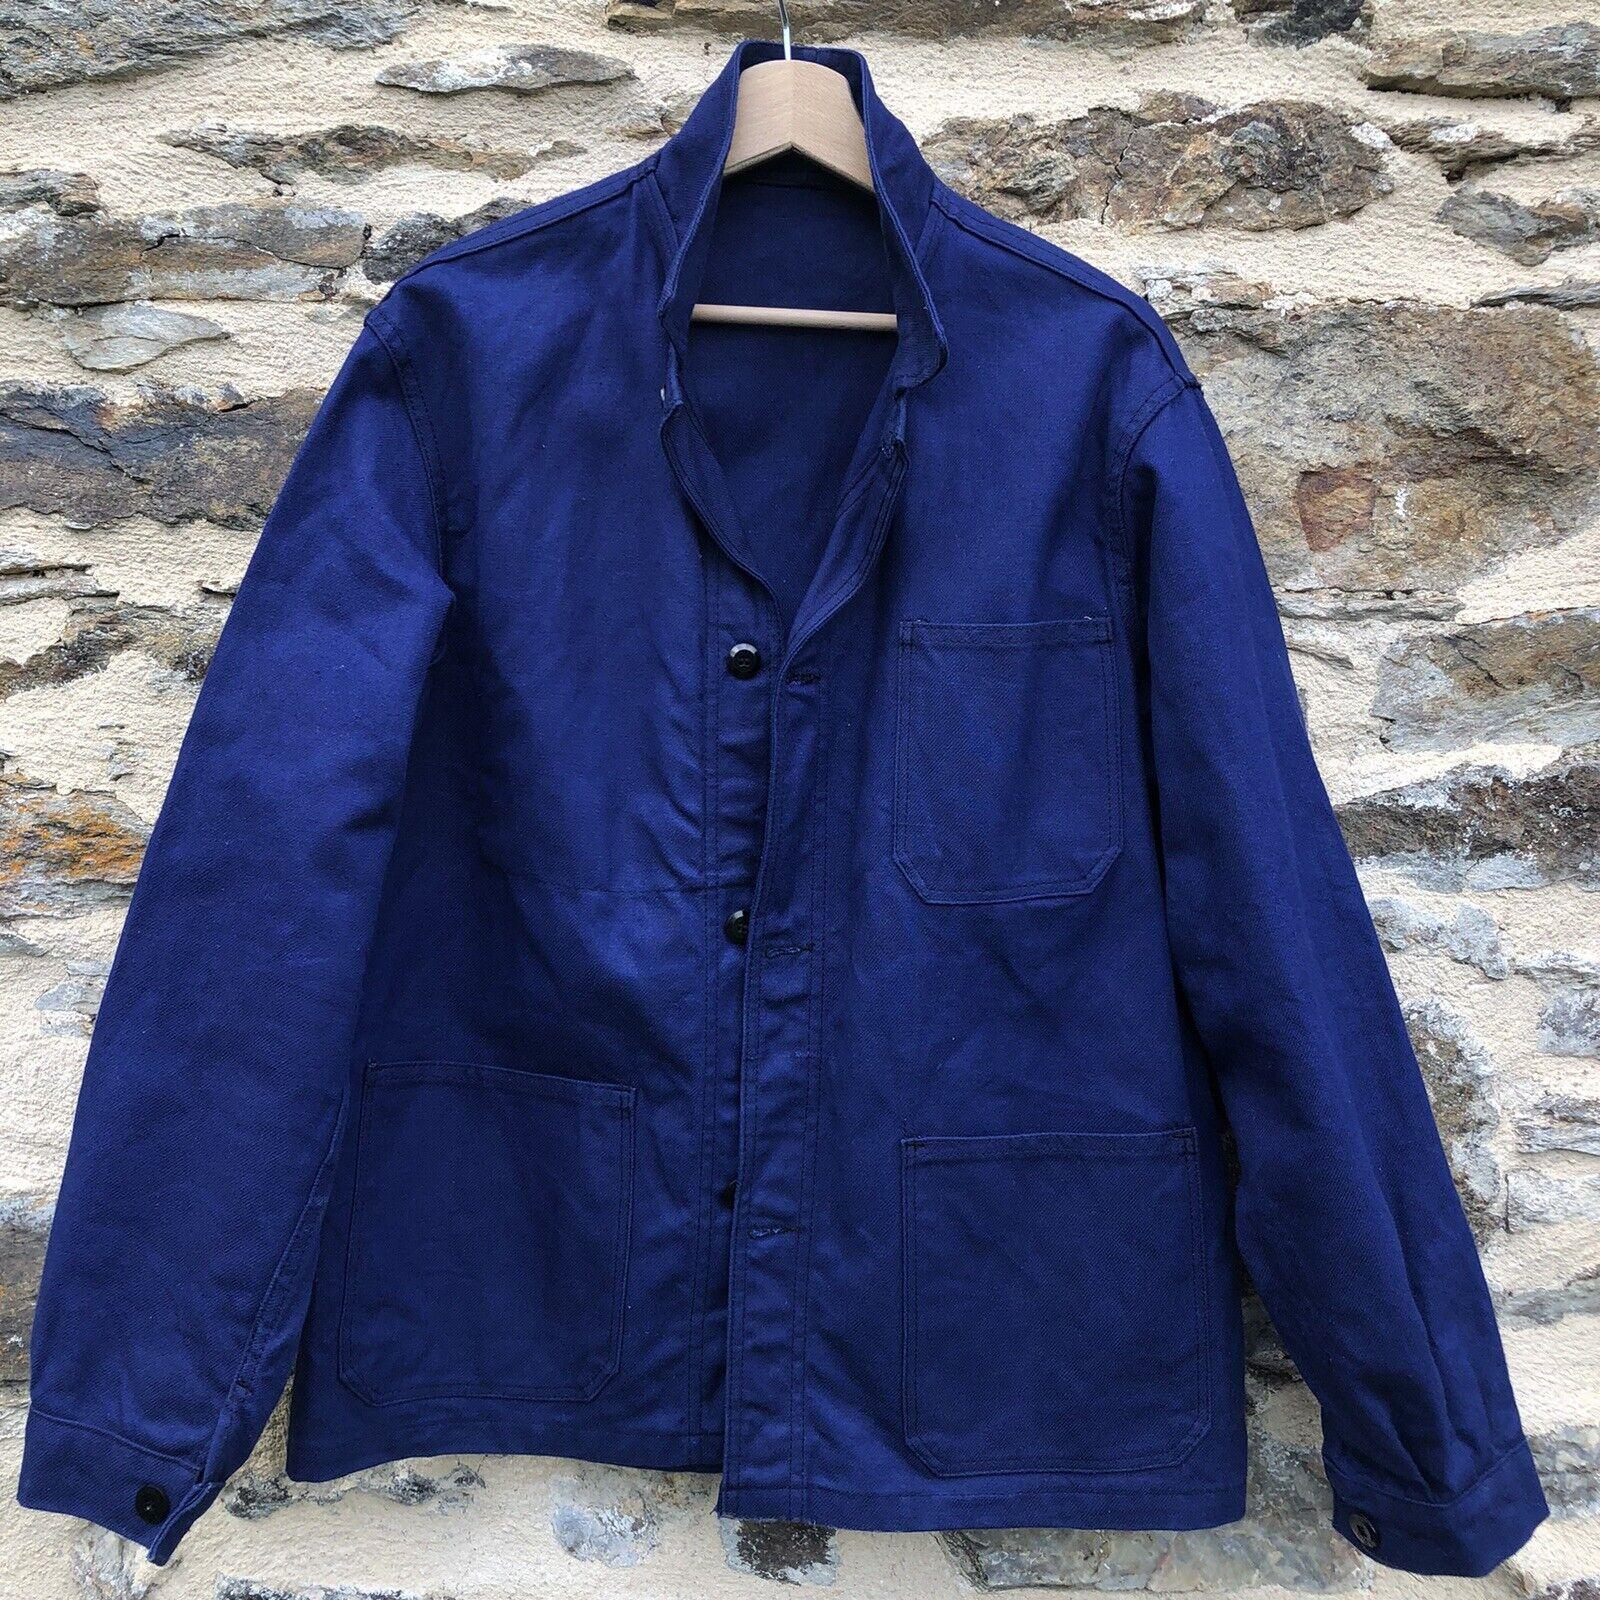 L XL Size S M Vintage French Workwear German Work Jacket Sanfor Navy Blue Chore Coat Bleu de Travail